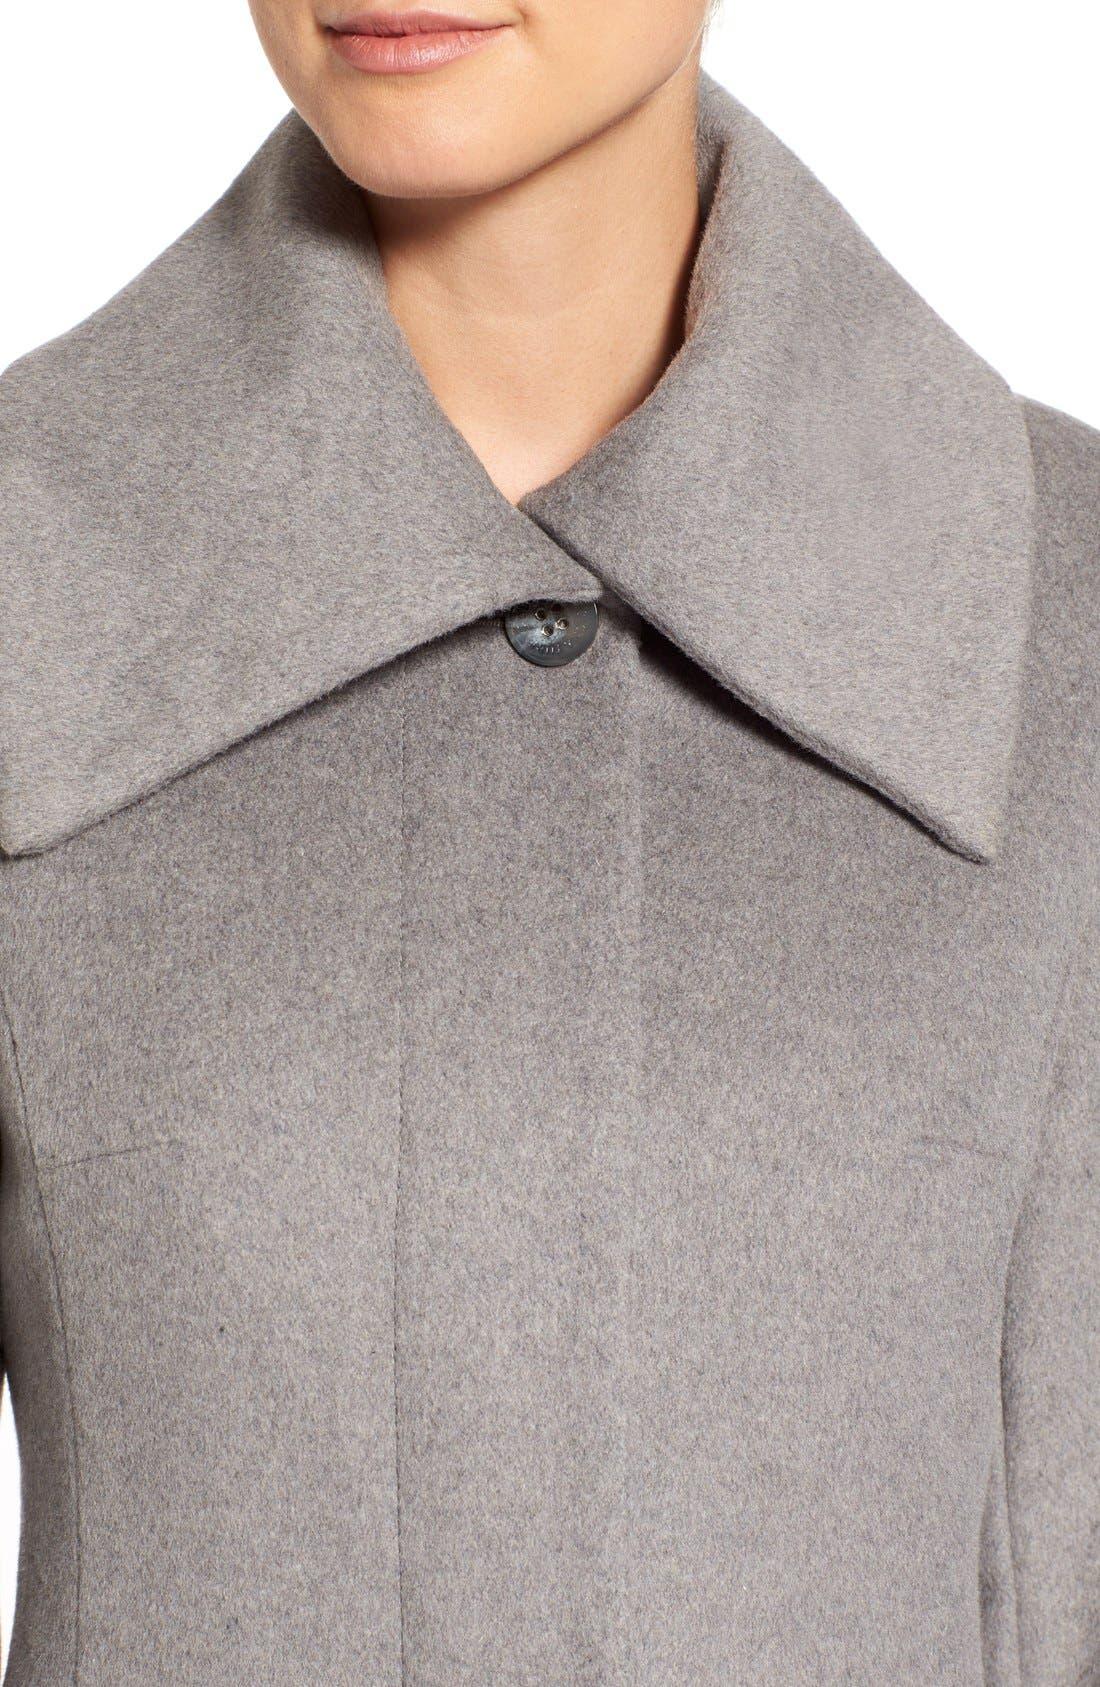 Single Breasted Wool Blend Coat,                             Alternate thumbnail 4, color,                             Platinum